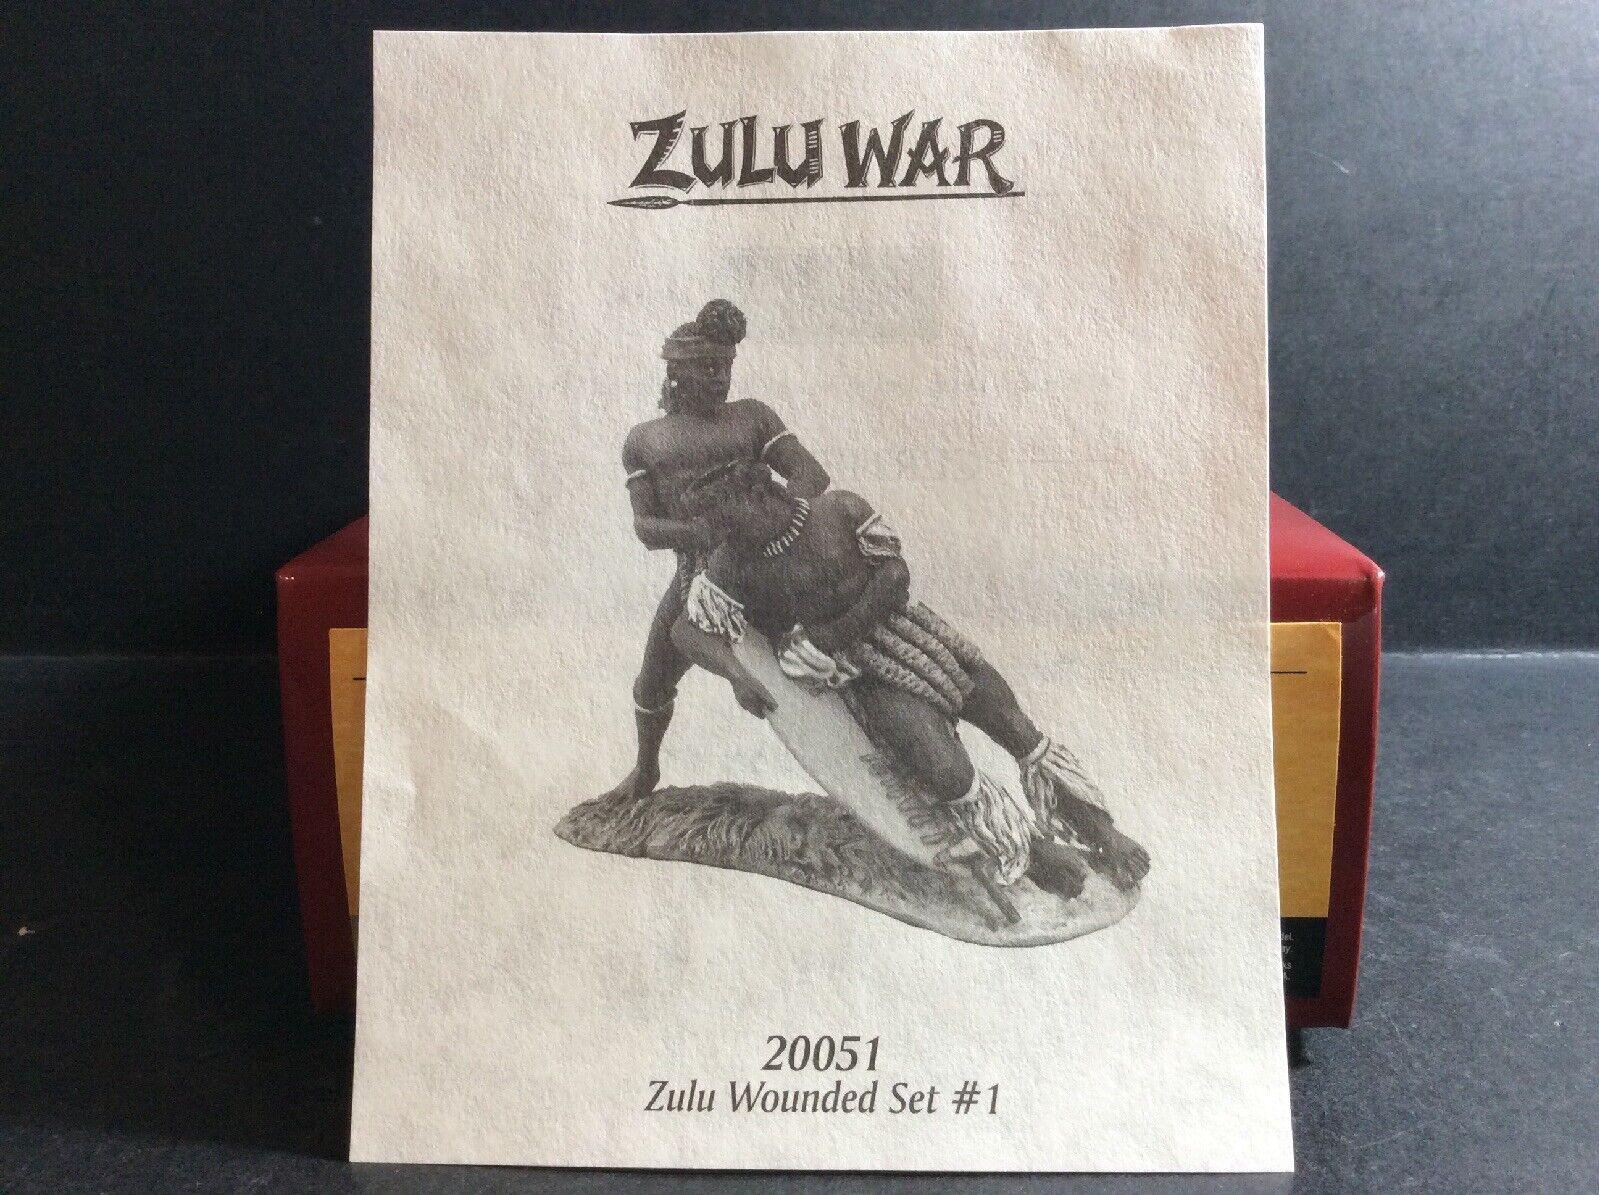 Britains Zulu War 20051 Zulu Wounded No.1 2-pce 54mm Figures Ltd Ed 050 800 MIB